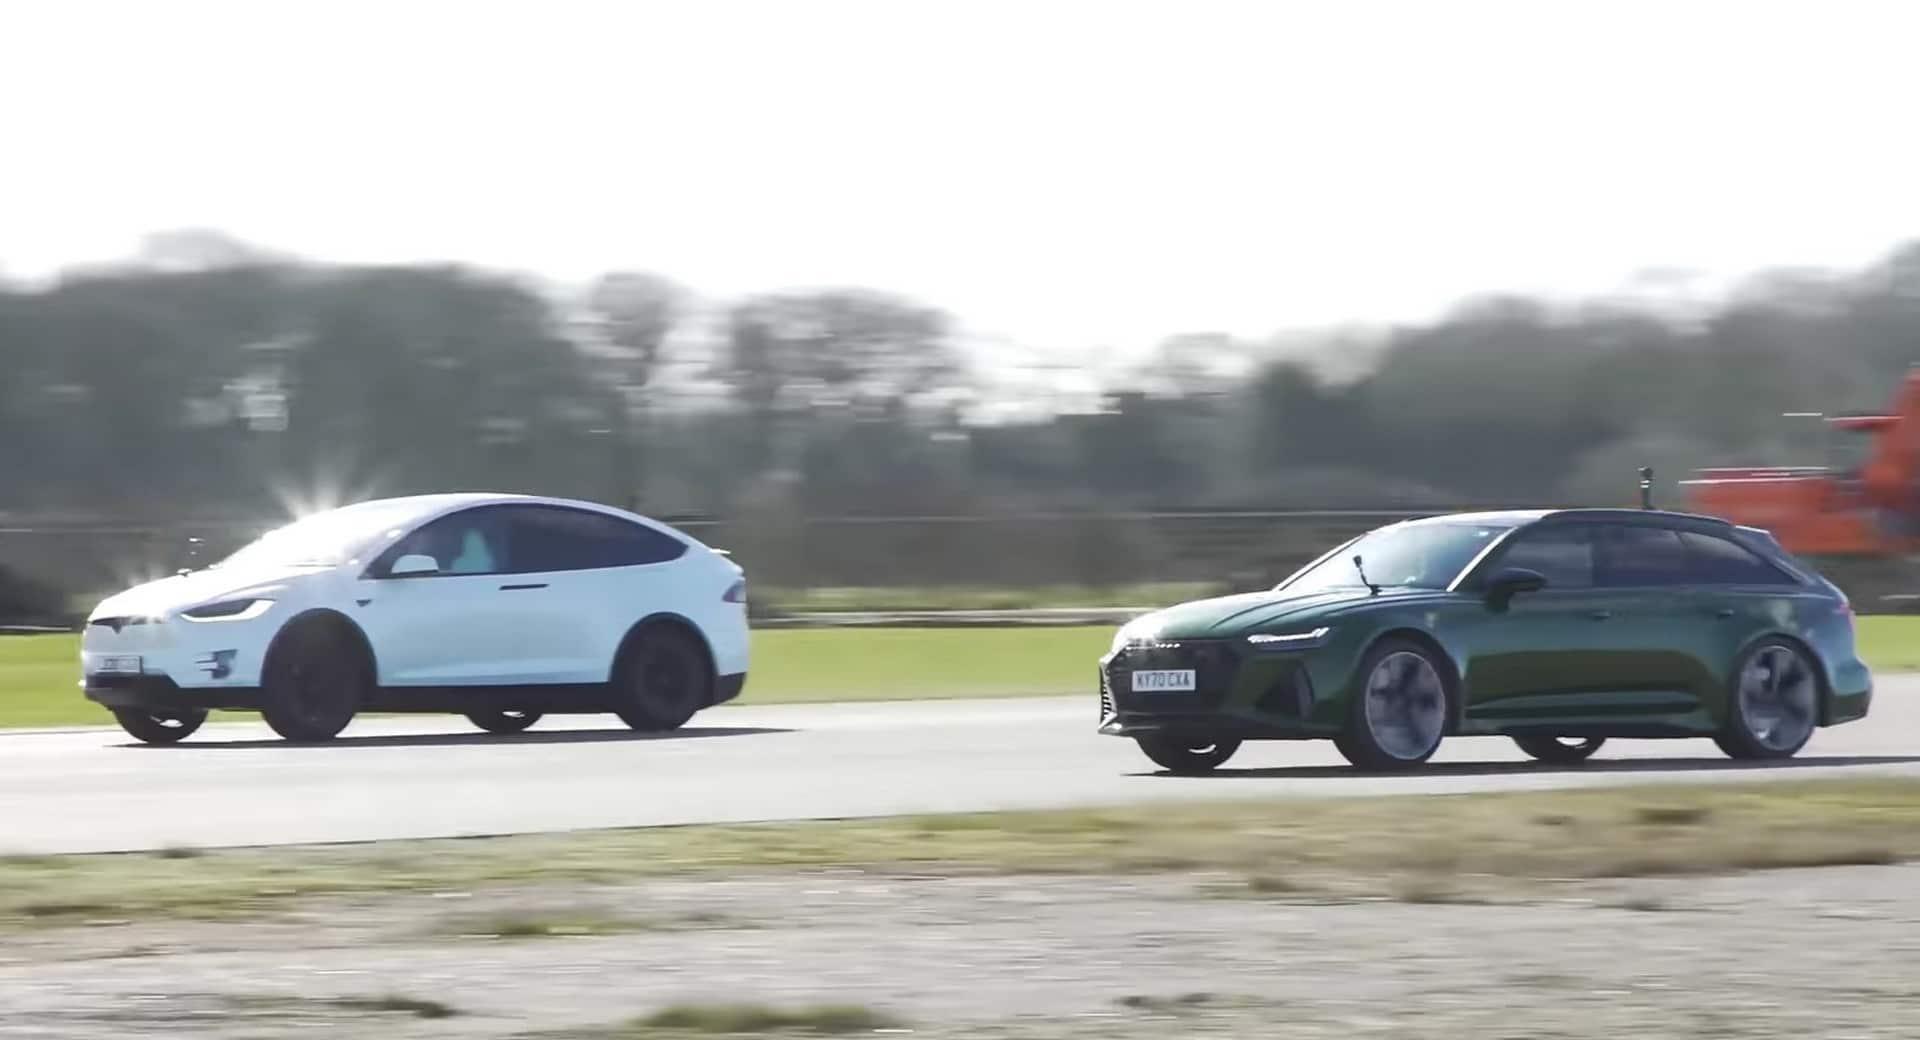 El Audi RS 6 Avant se enfrenta al Tesla Model X